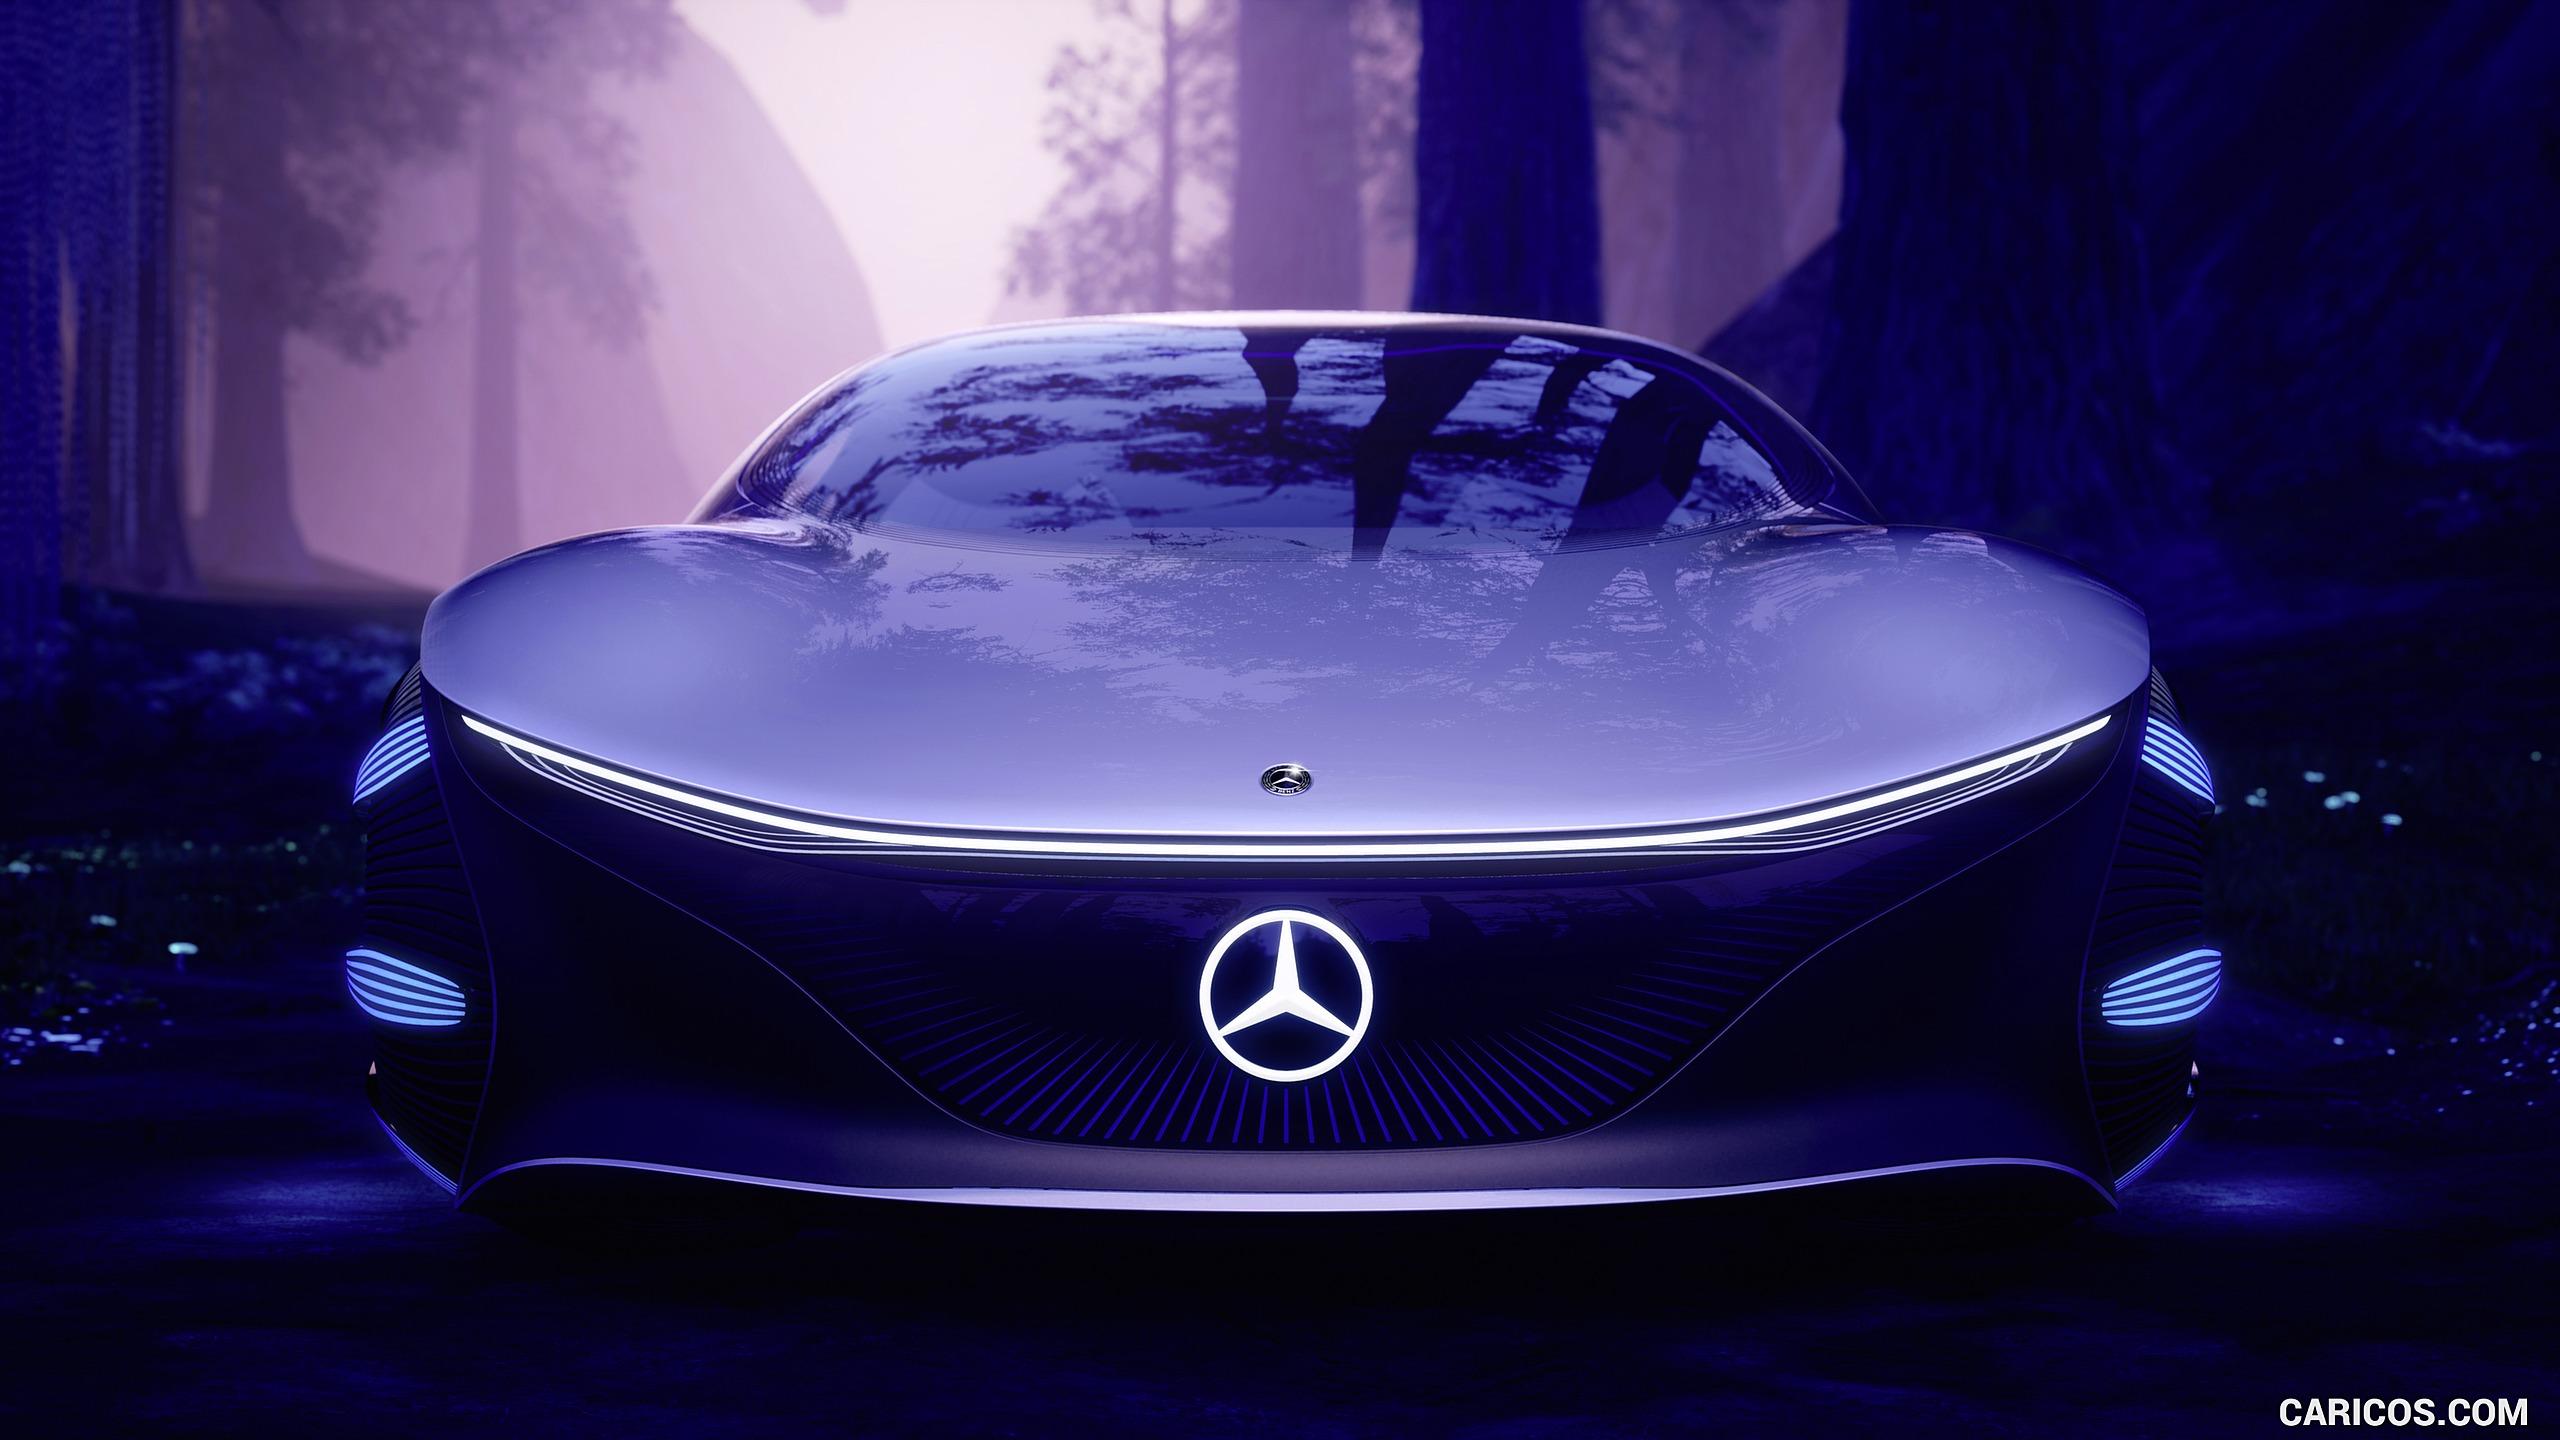 2020 Mercedes Benz VISION AVTR Concept   Front HD Wallpaper 24 2560x1440